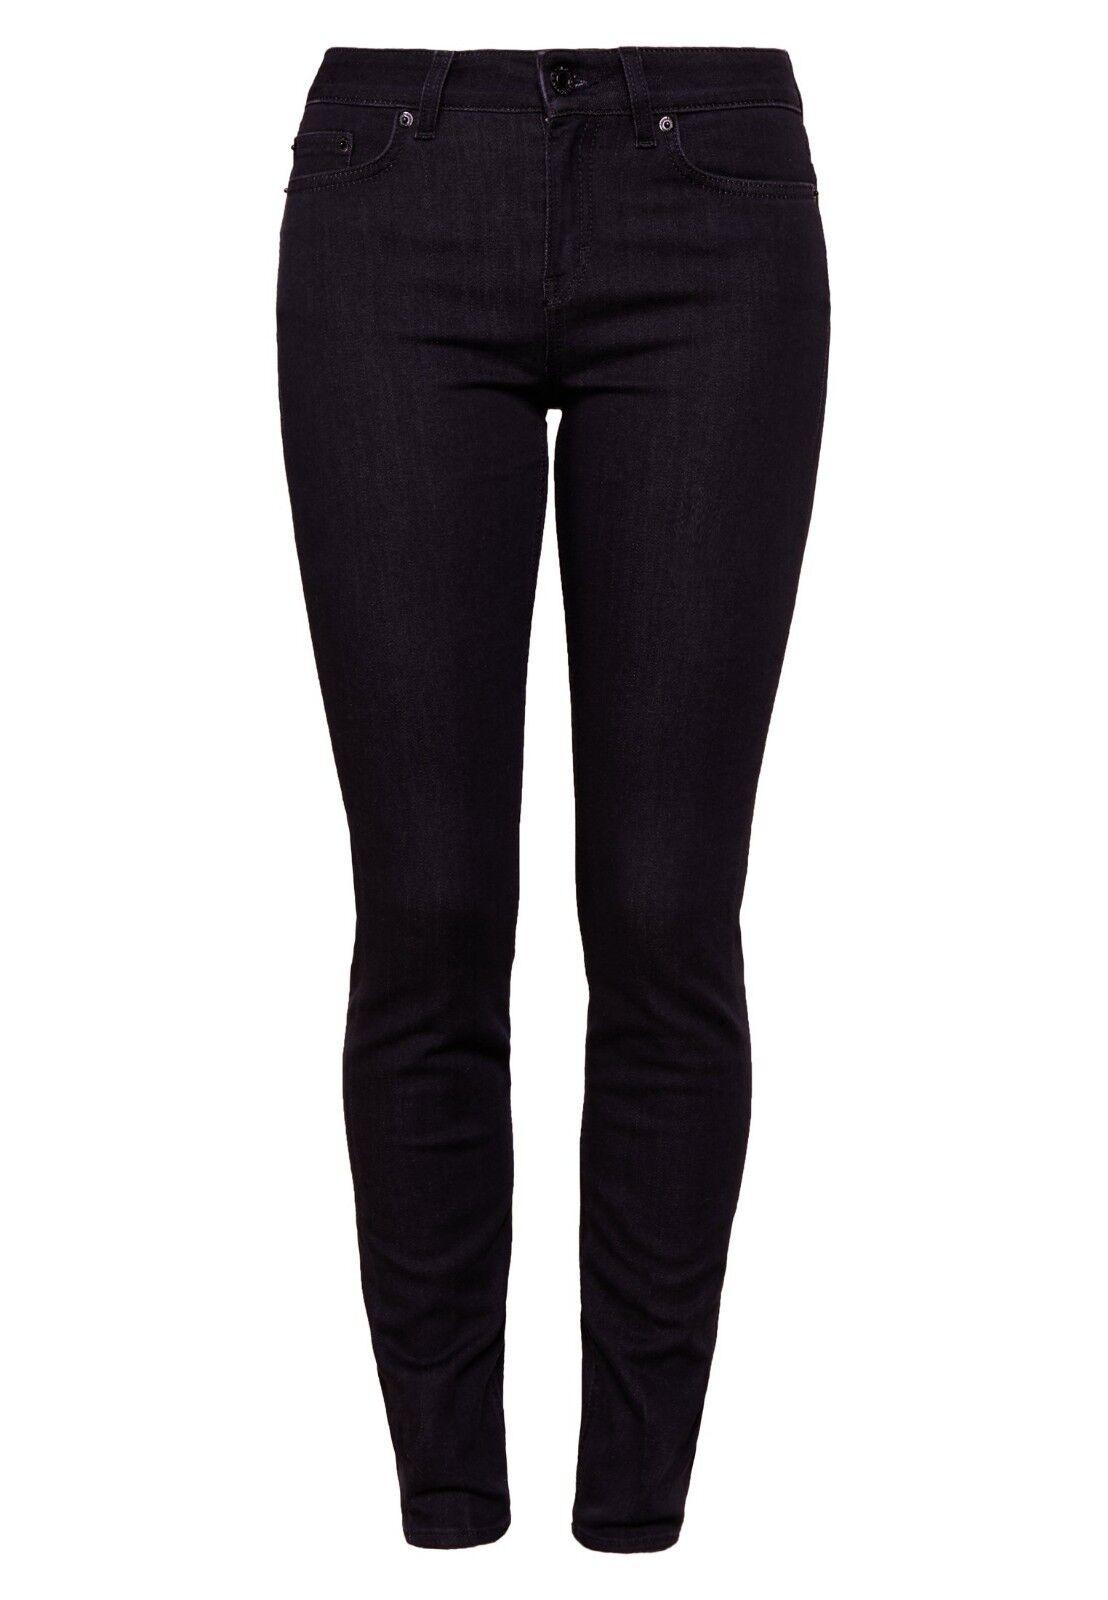 DRYKORN PULL Damen Jeans Slim Fit Blau Hose Skinny W28 L32 A4762